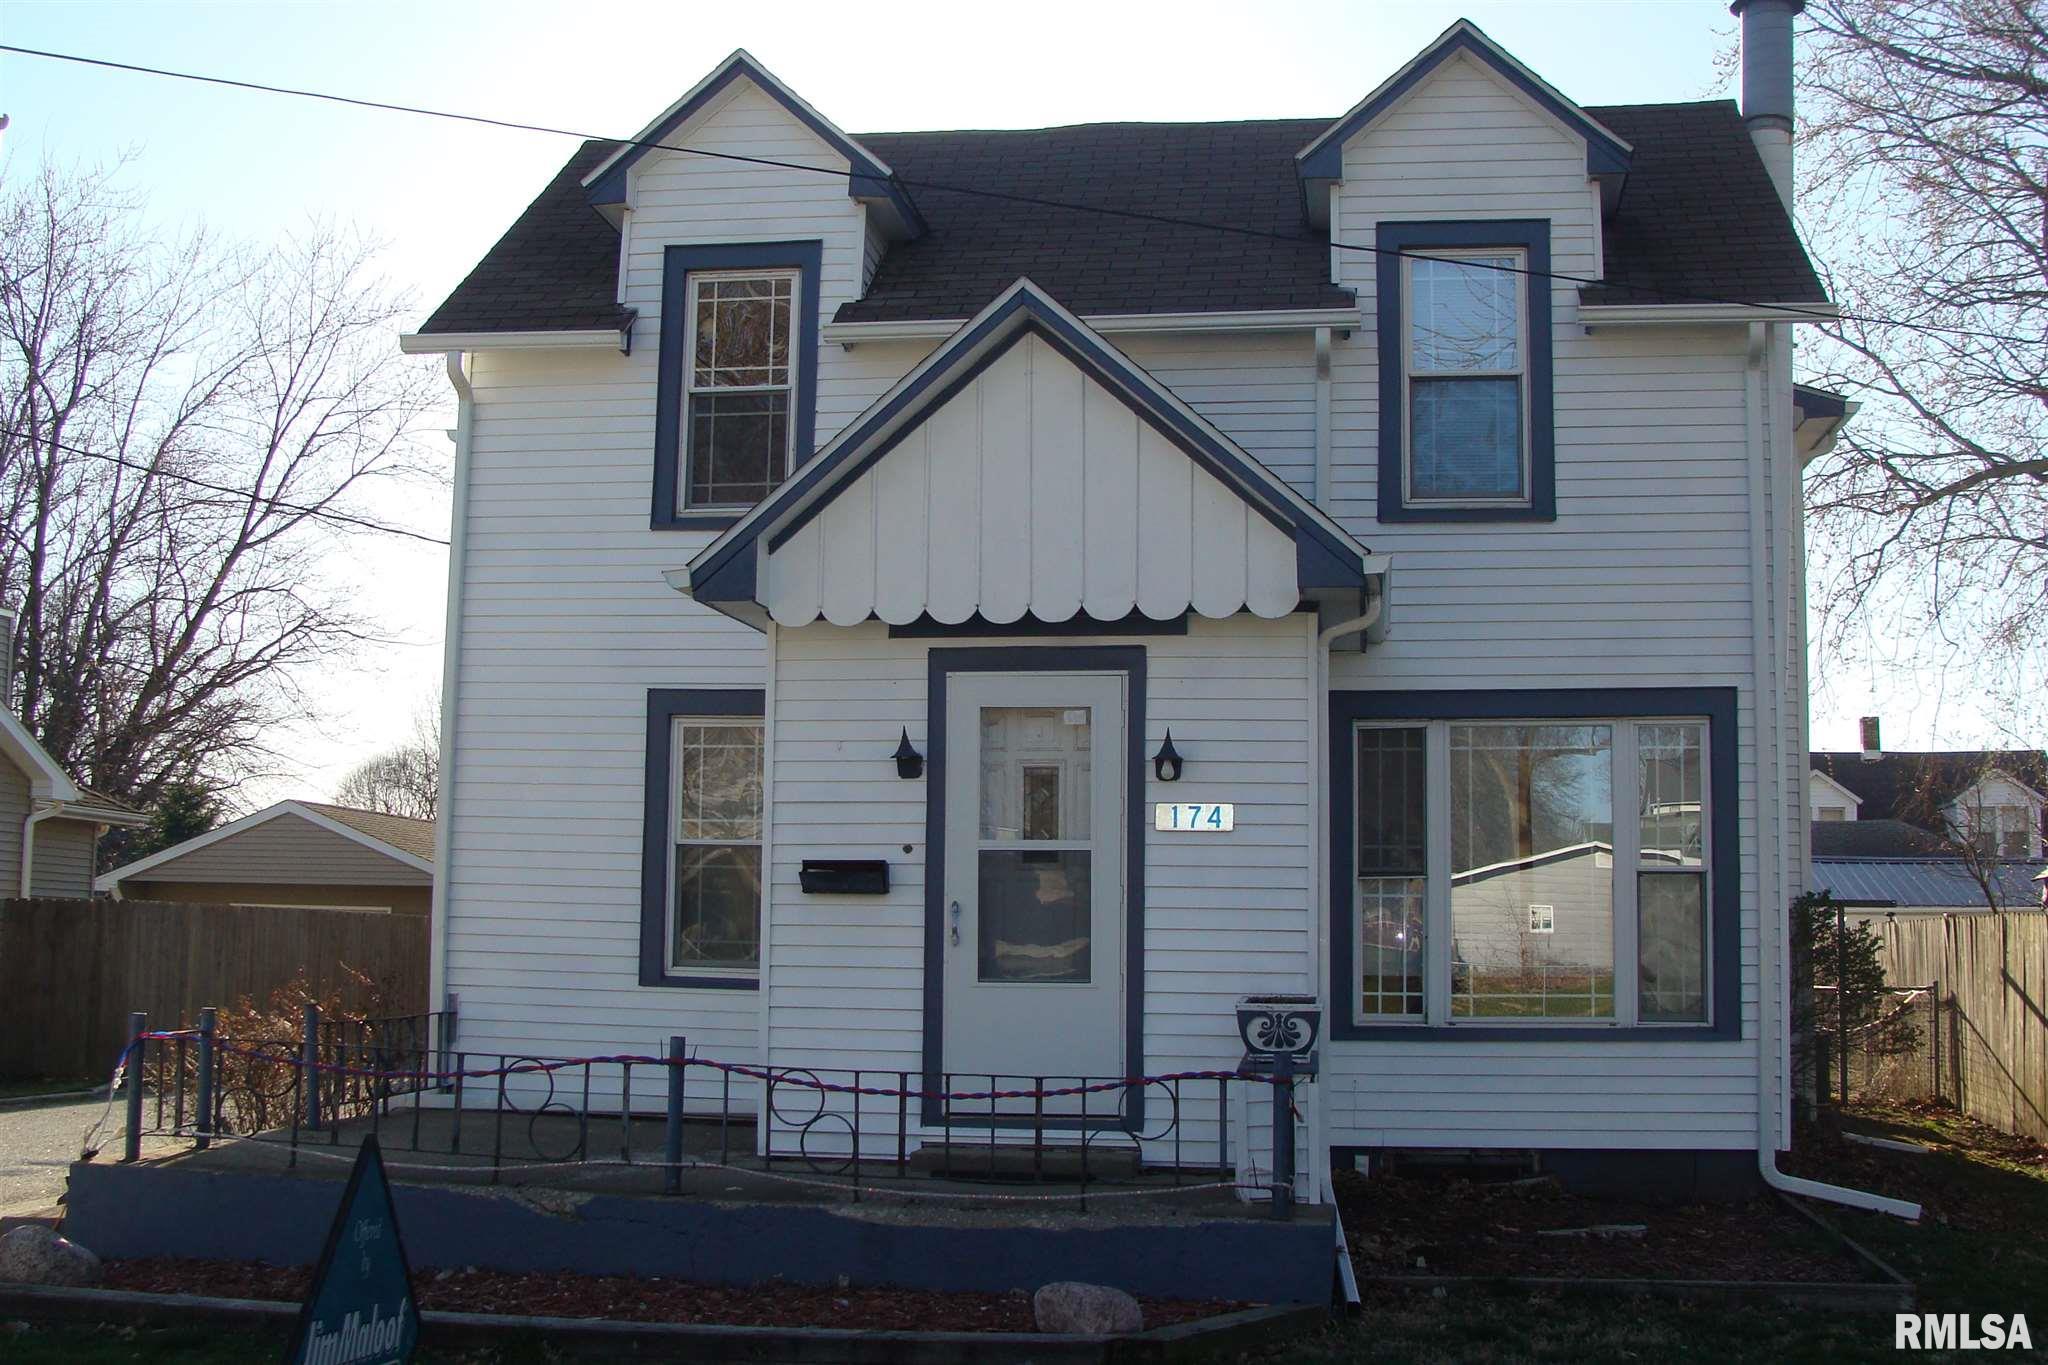 174 N WALL Property Photo - Farmington, IL real estate listing